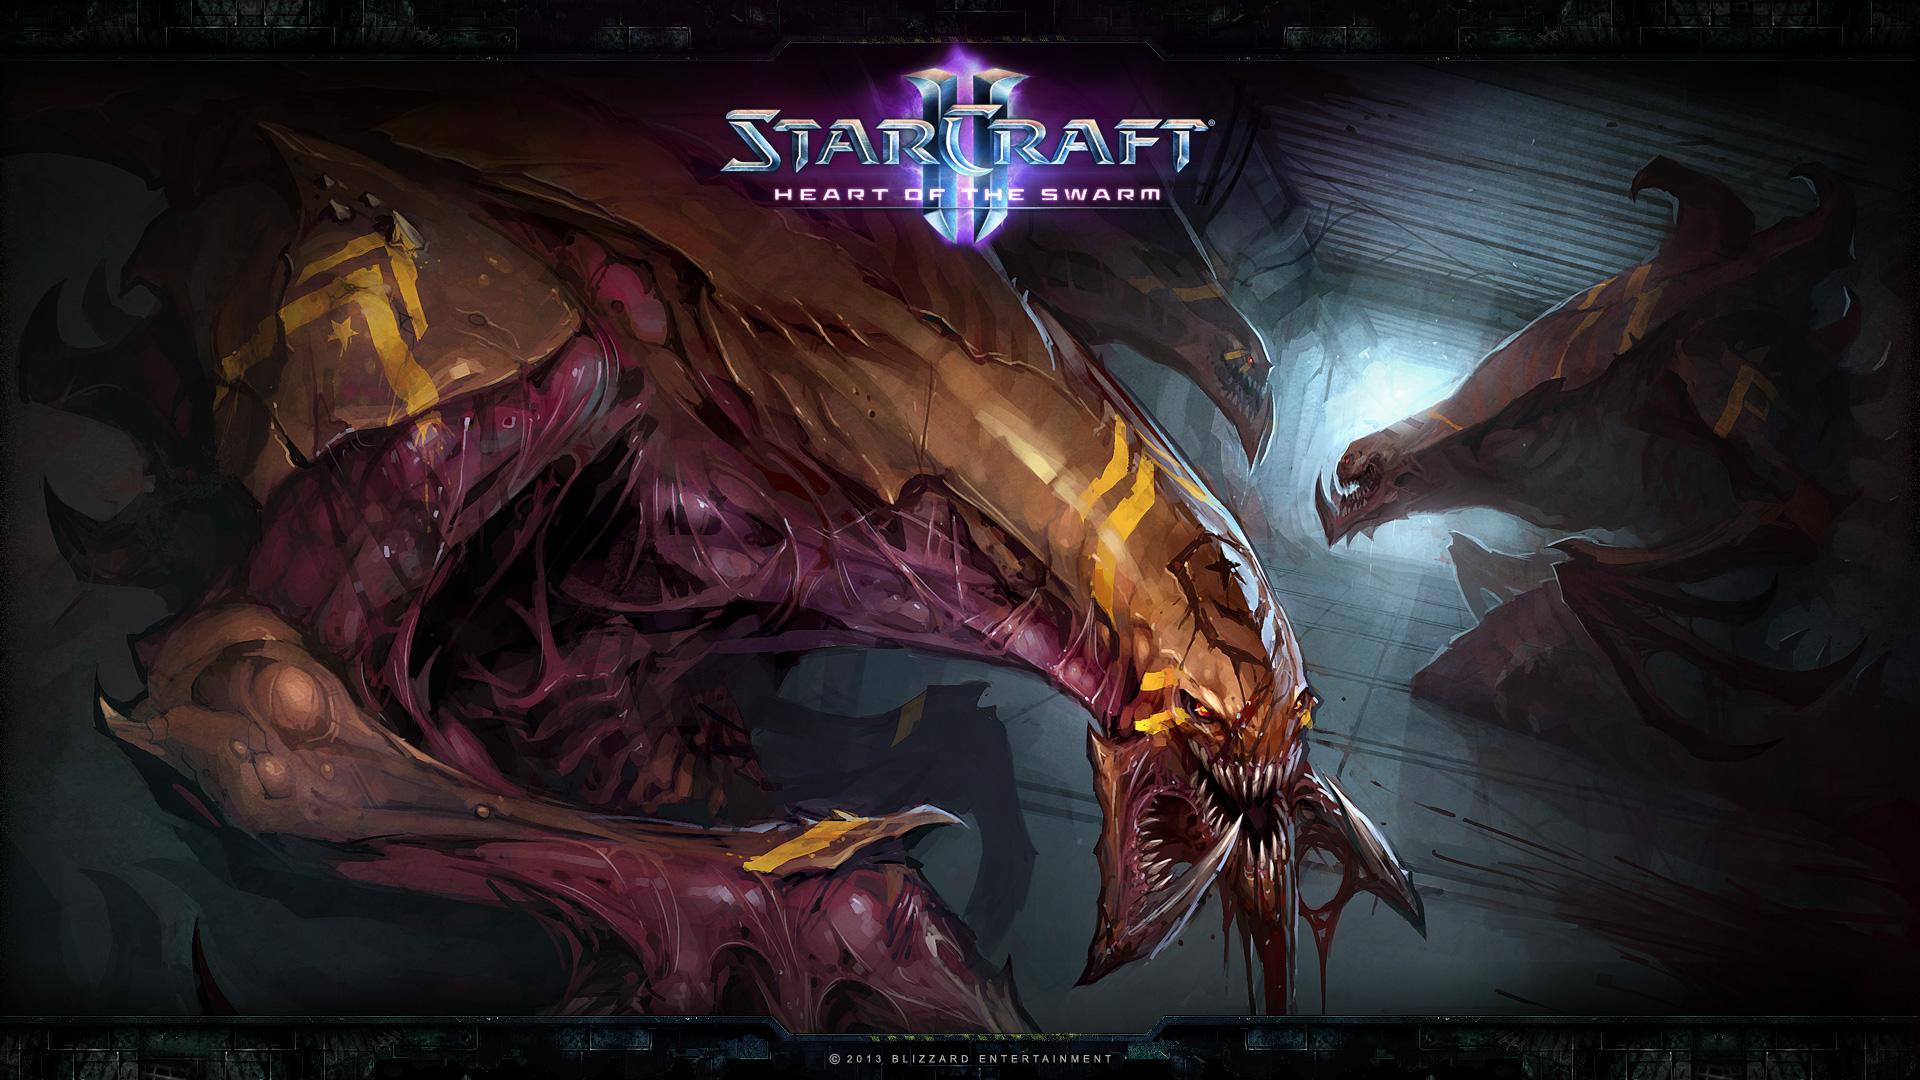 Starcraft 2 Heart of the Swarm wallpaper 12